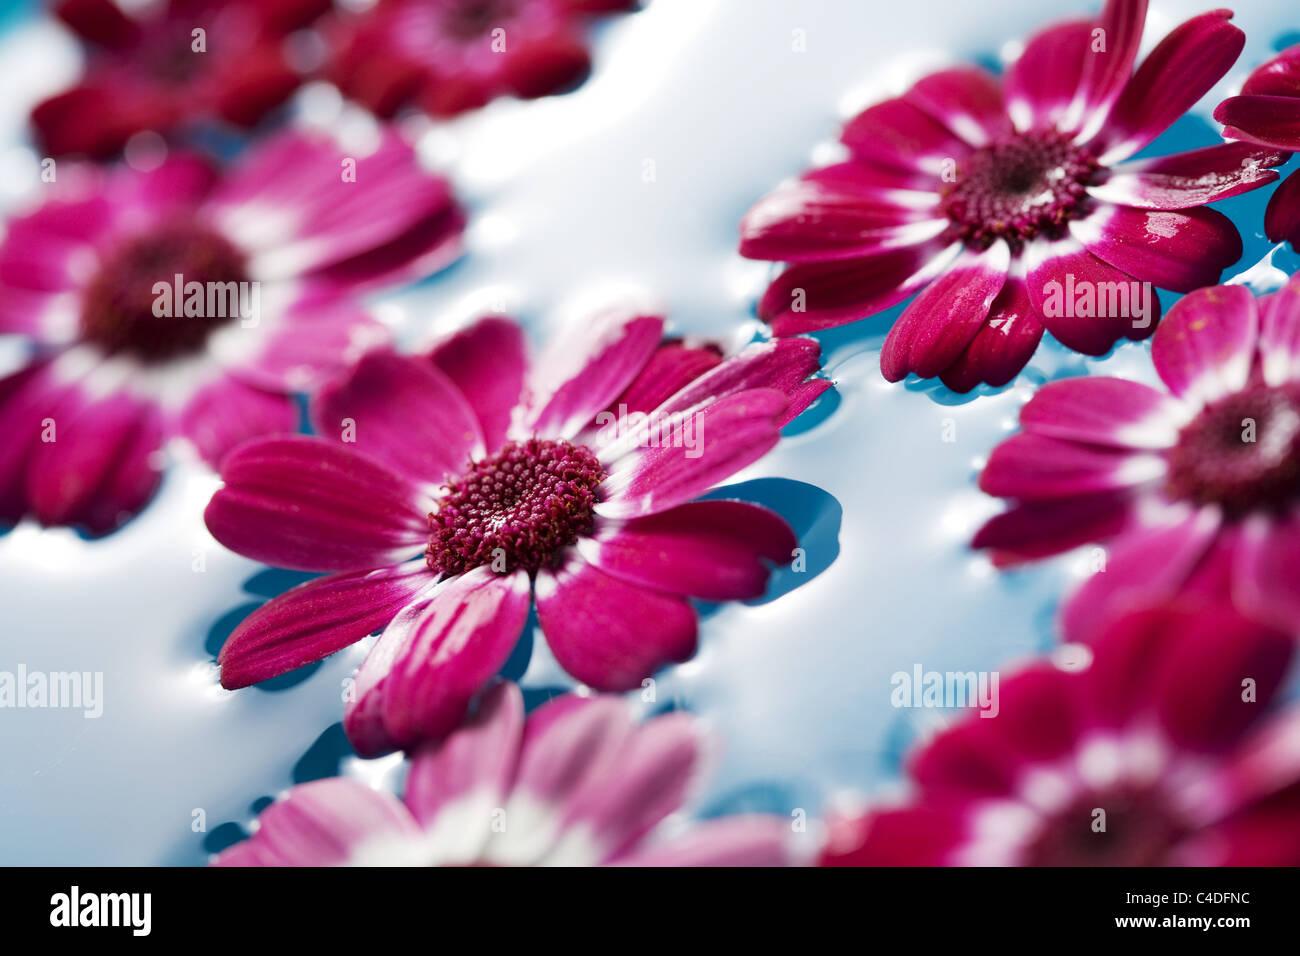 floating flowers Stock Photo: 37177096 - Alamy